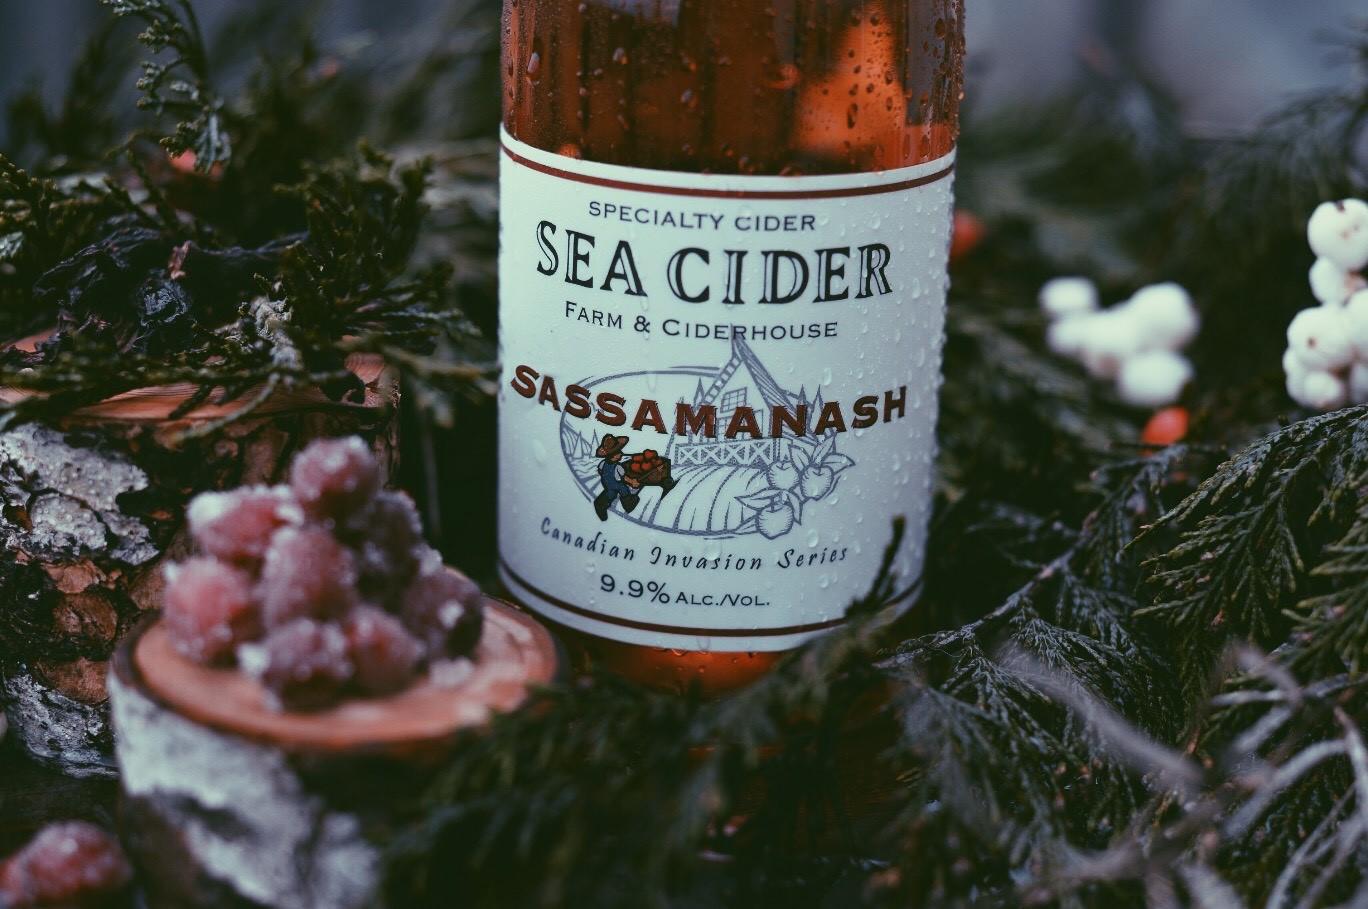 Sassamanash - Sea Cider.jpg